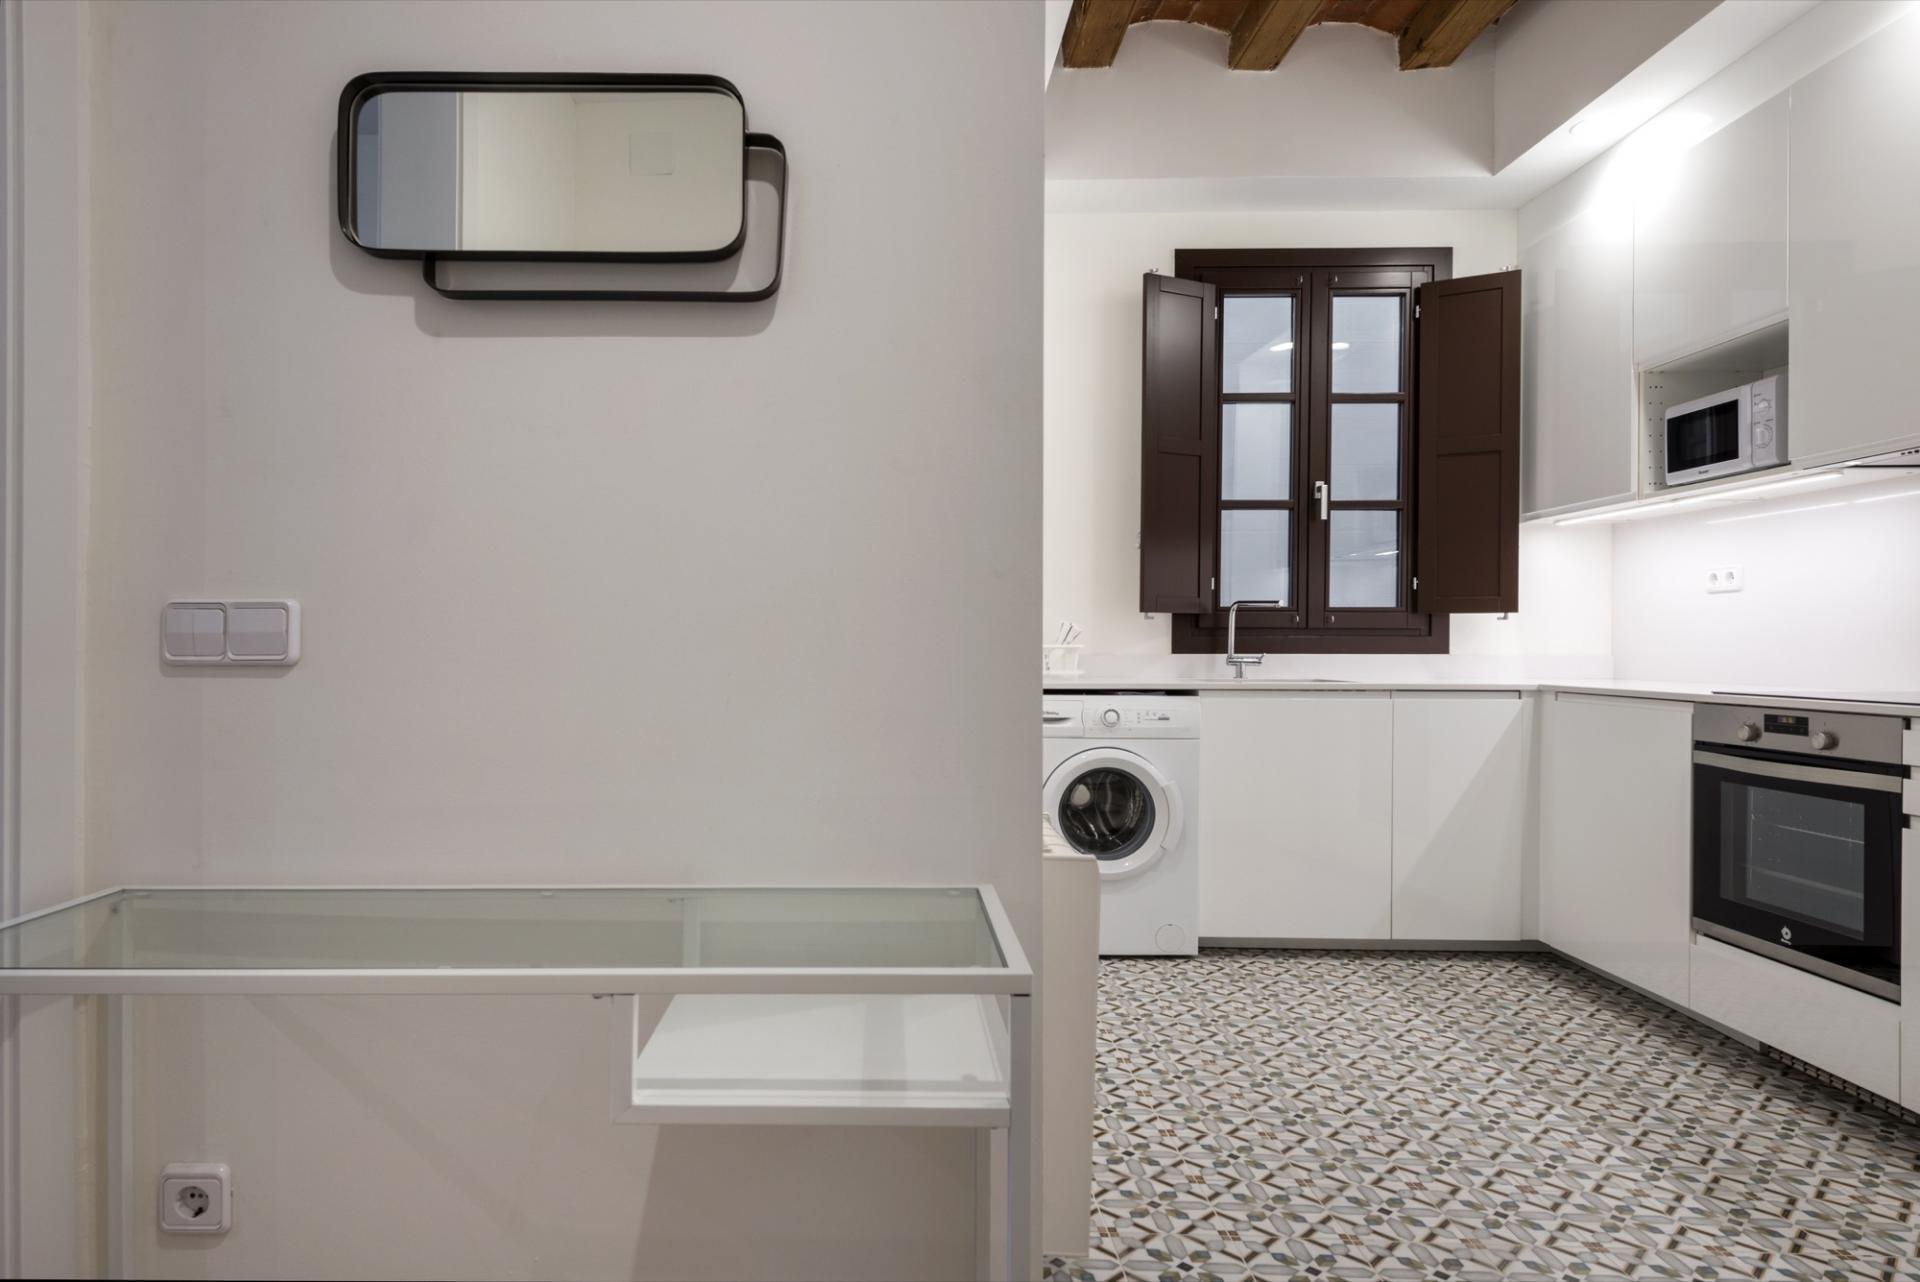 Washing machine at Pelayo Suites, El Raval, Barcelona - Citybase Apartments